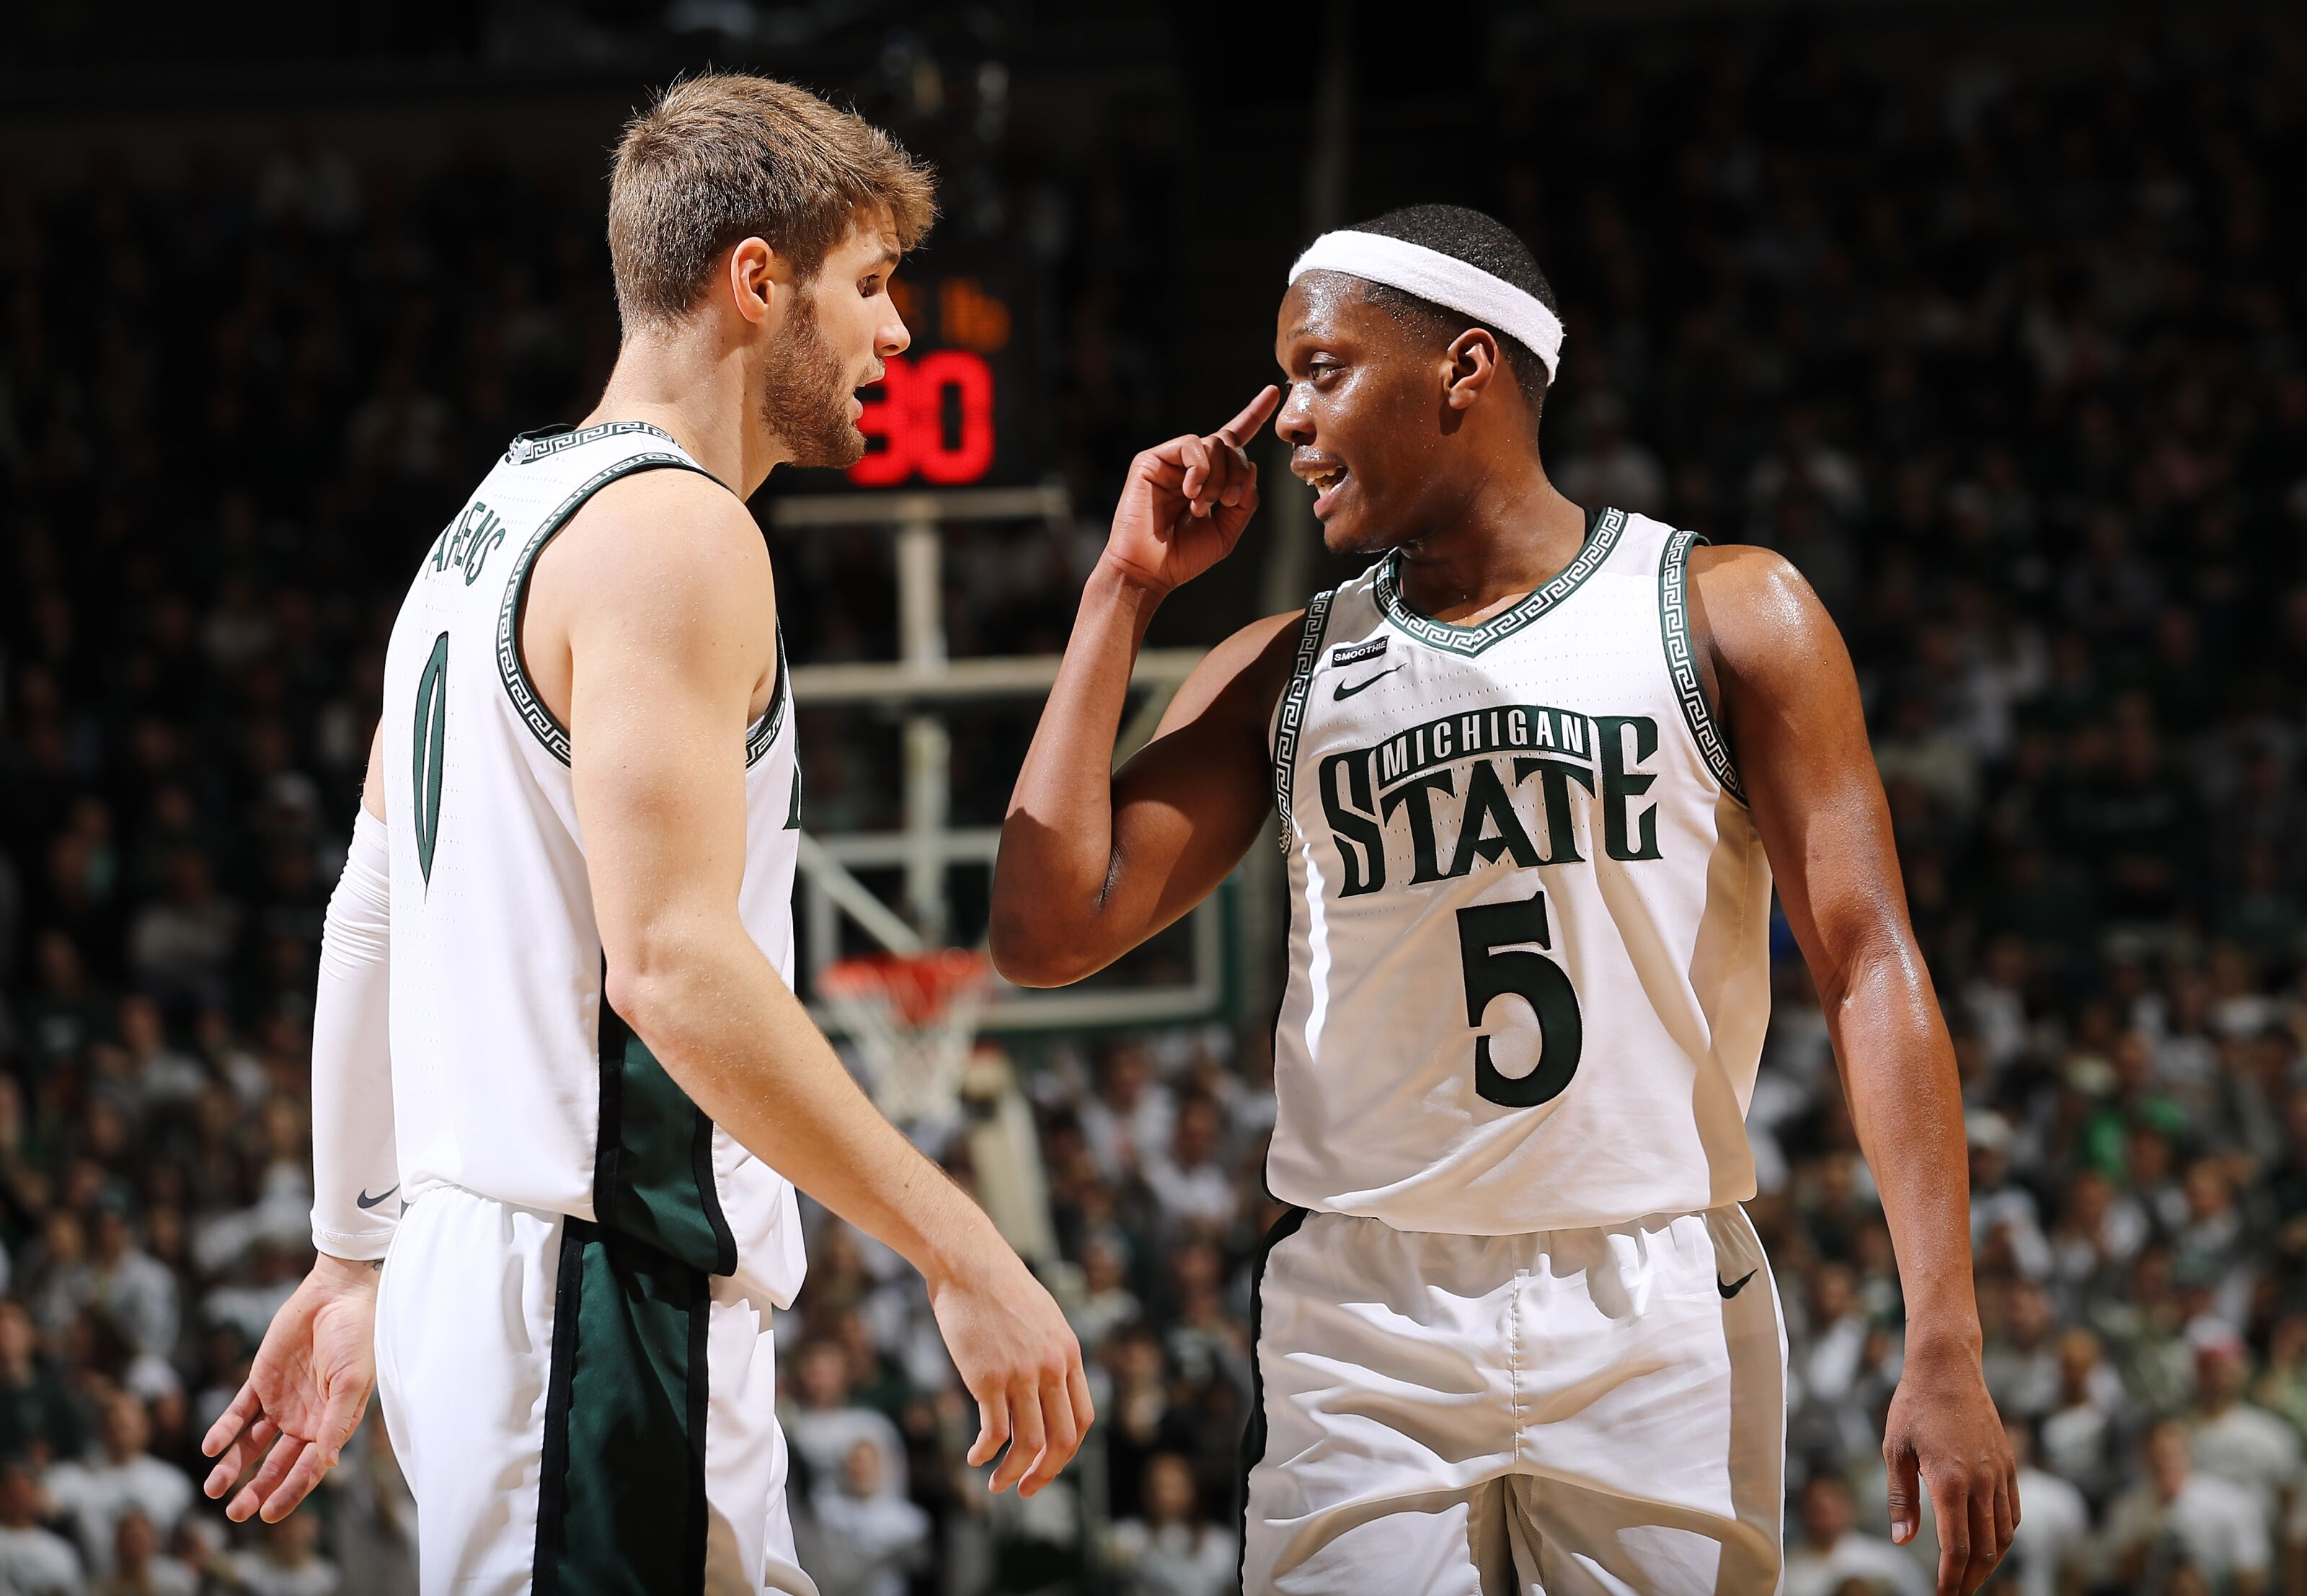 Michigan State Basketball: 5 ways to turn 2019-20 season around